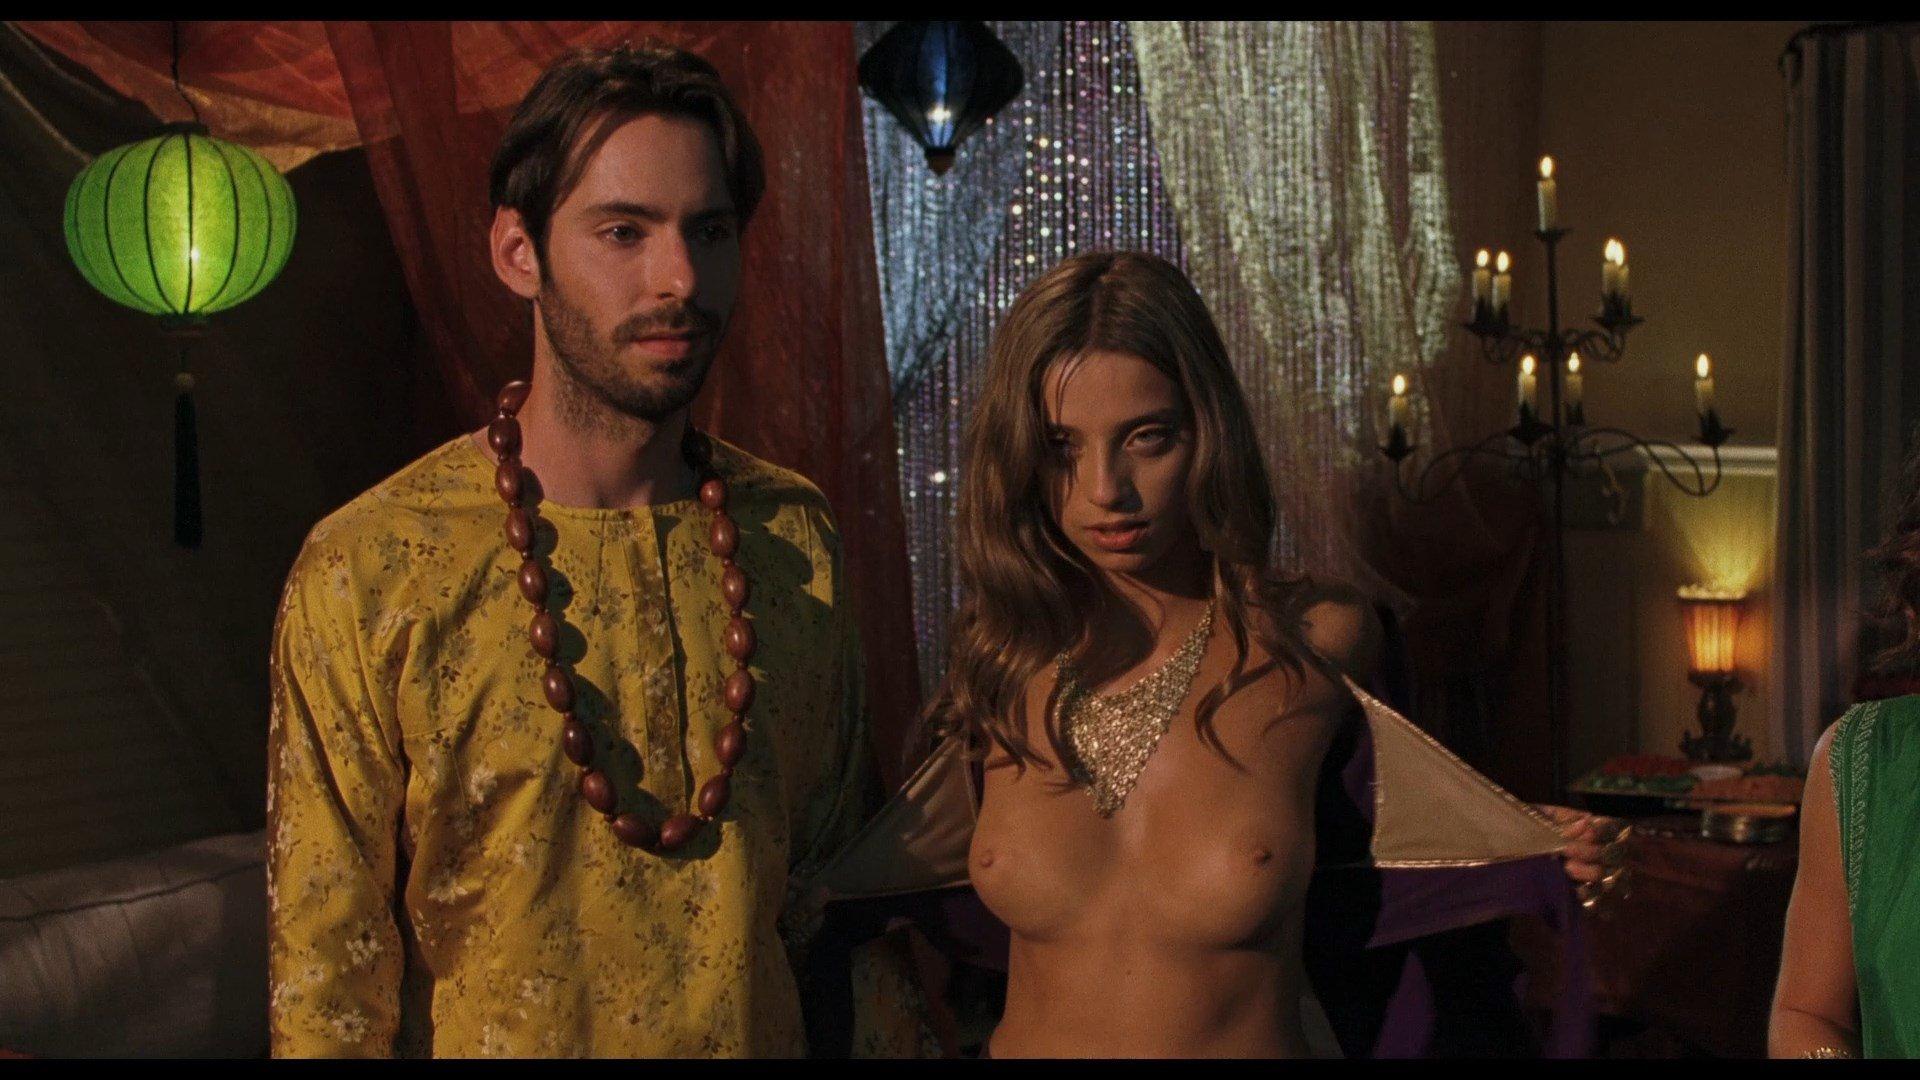 Angela Sarafyan Tits angela sarafyan nude photos and videos | #thefappening